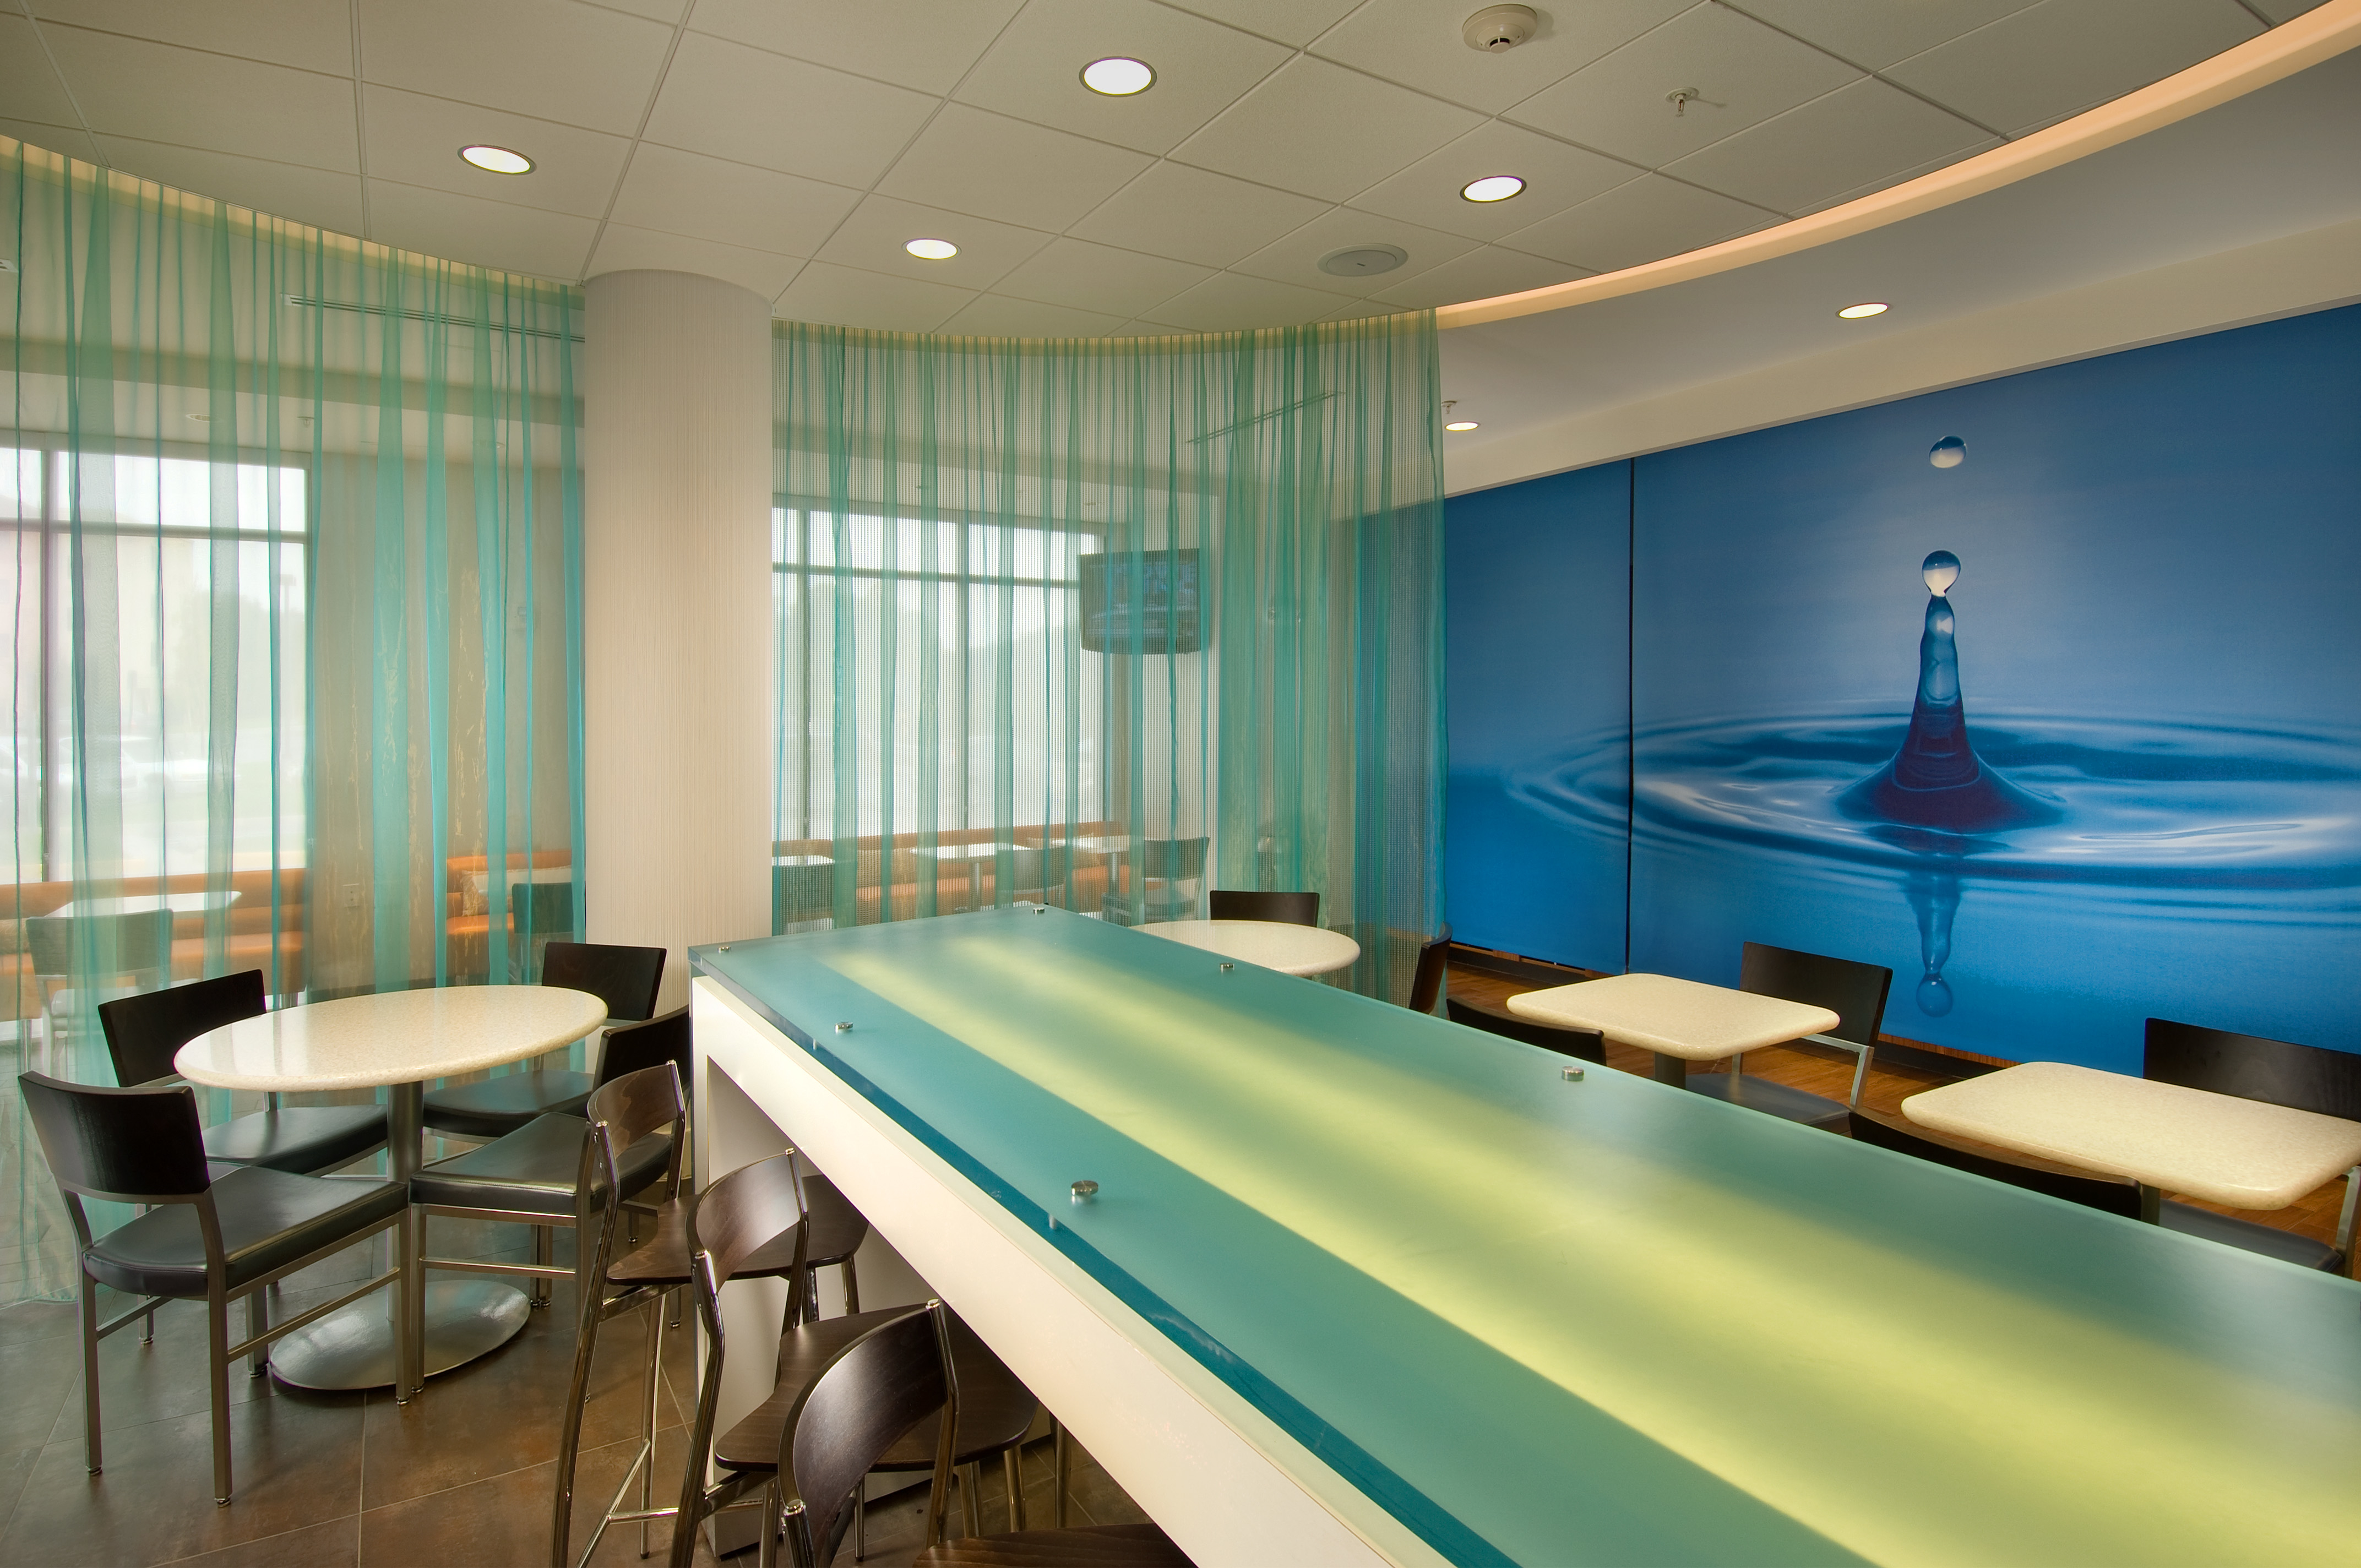 SpringHill Suites by Marriott Potomac Mills Woodbridge image 6